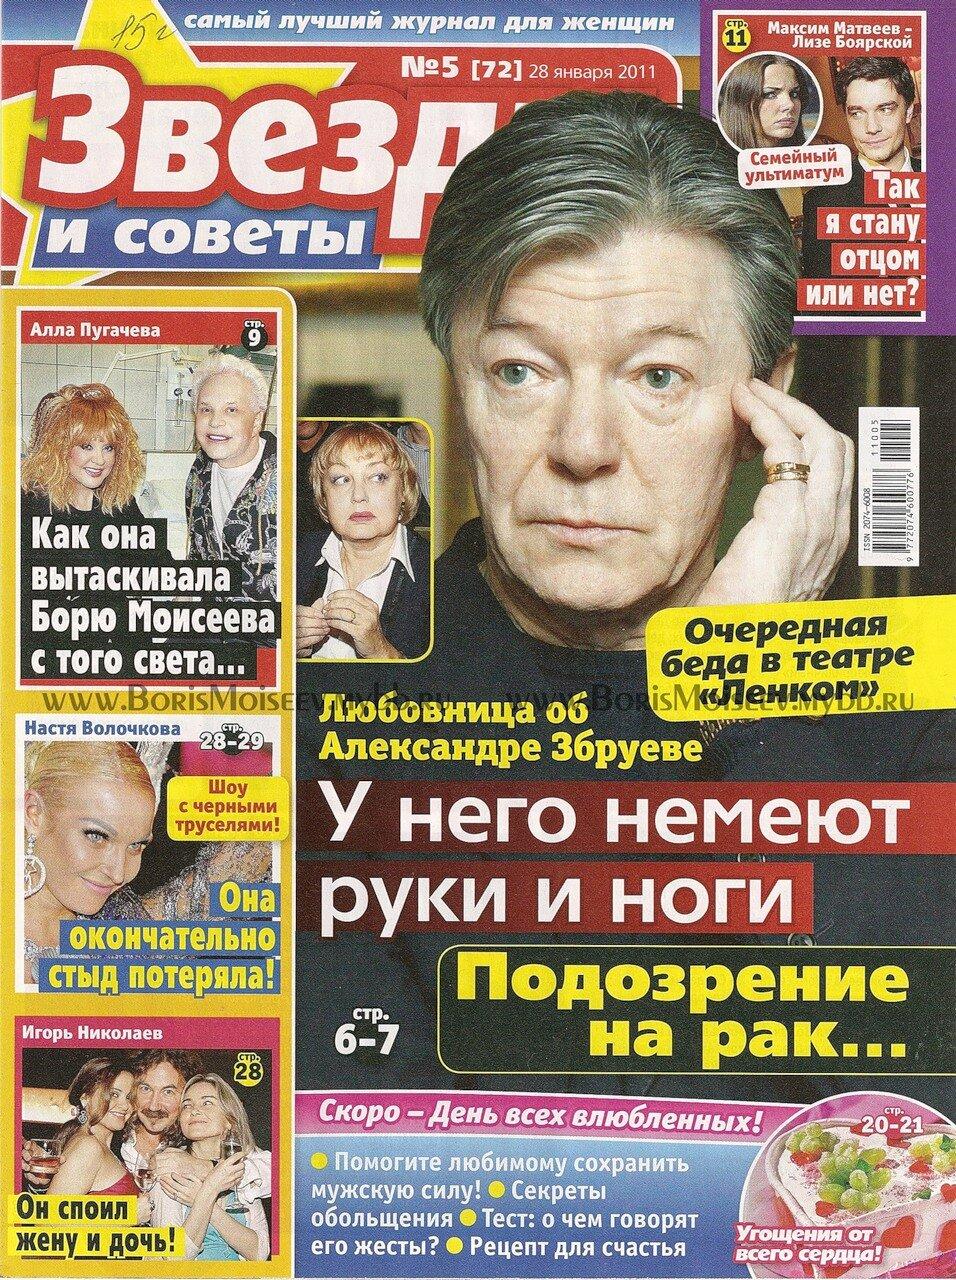 http://img-fotki.yandex.ru/get/5501/artik772.0/0_4b179_7868d42b_XXXL.jpg